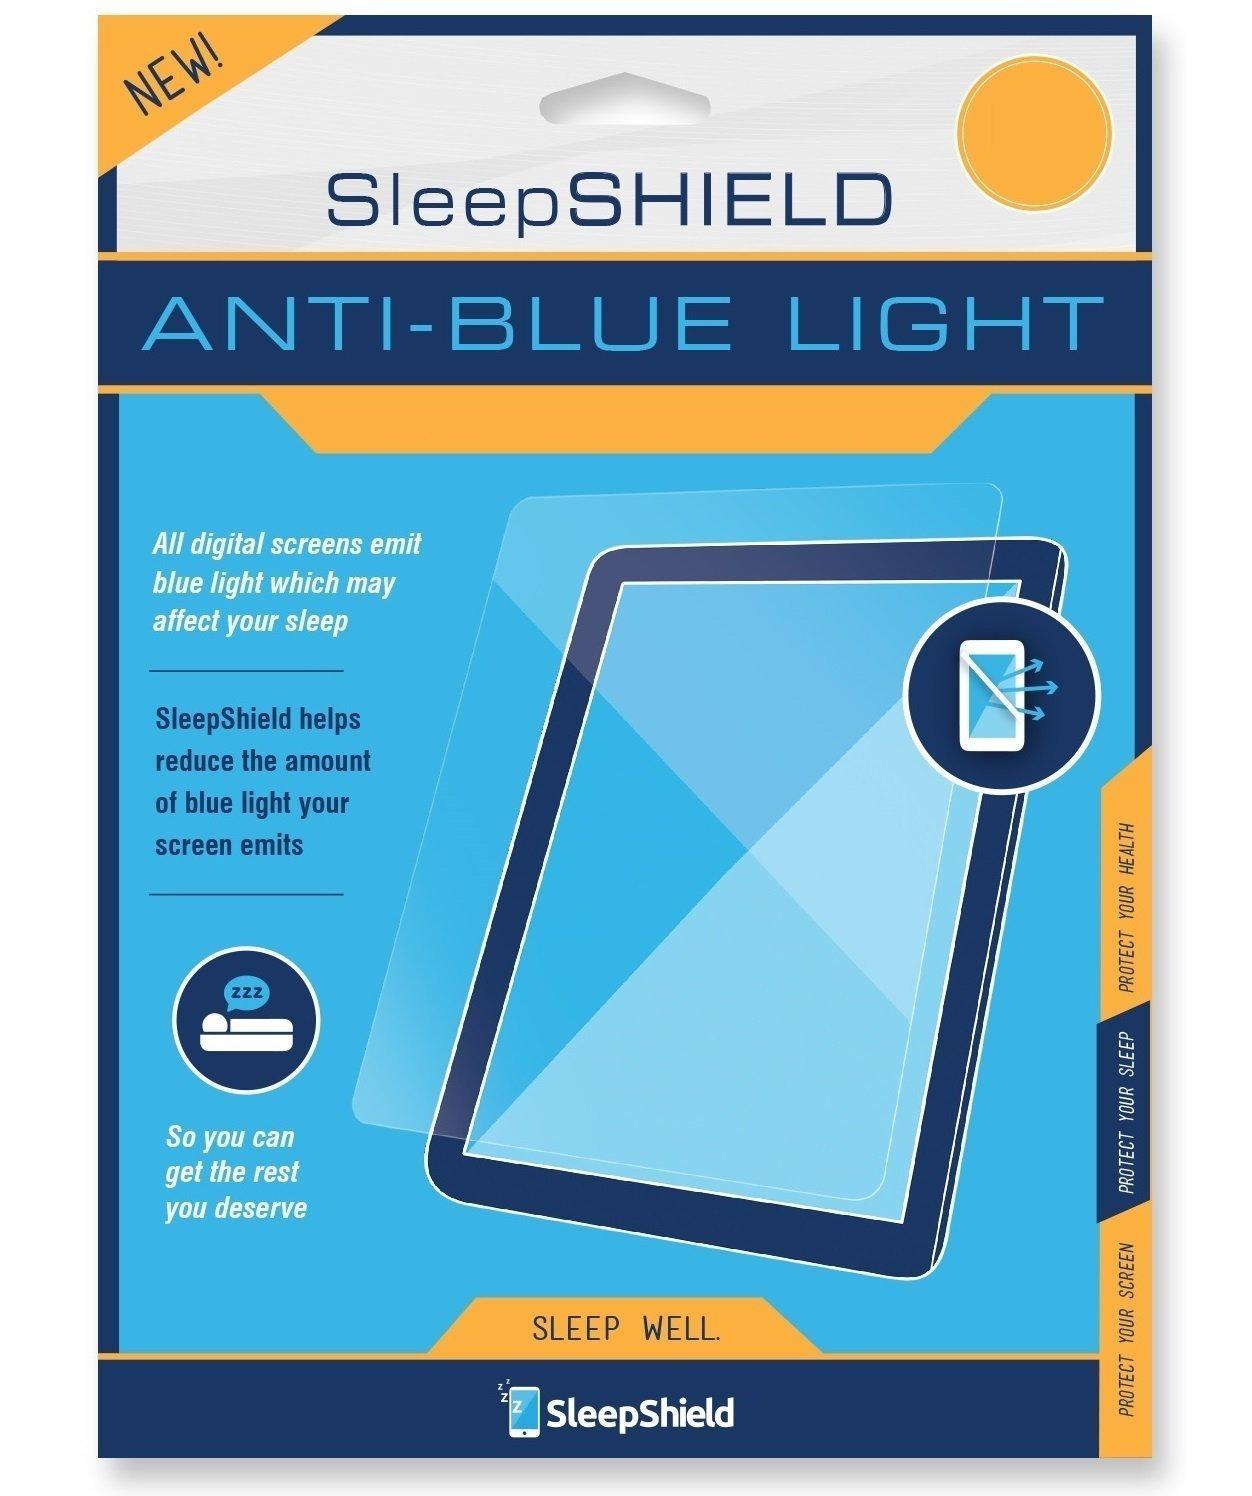 SleepShield IPad Mini Blue Light Filter   Protect Your Sleep With The  Orginal Blue Light Filter: Amazon.co.uk: Computers U0026 Accessories